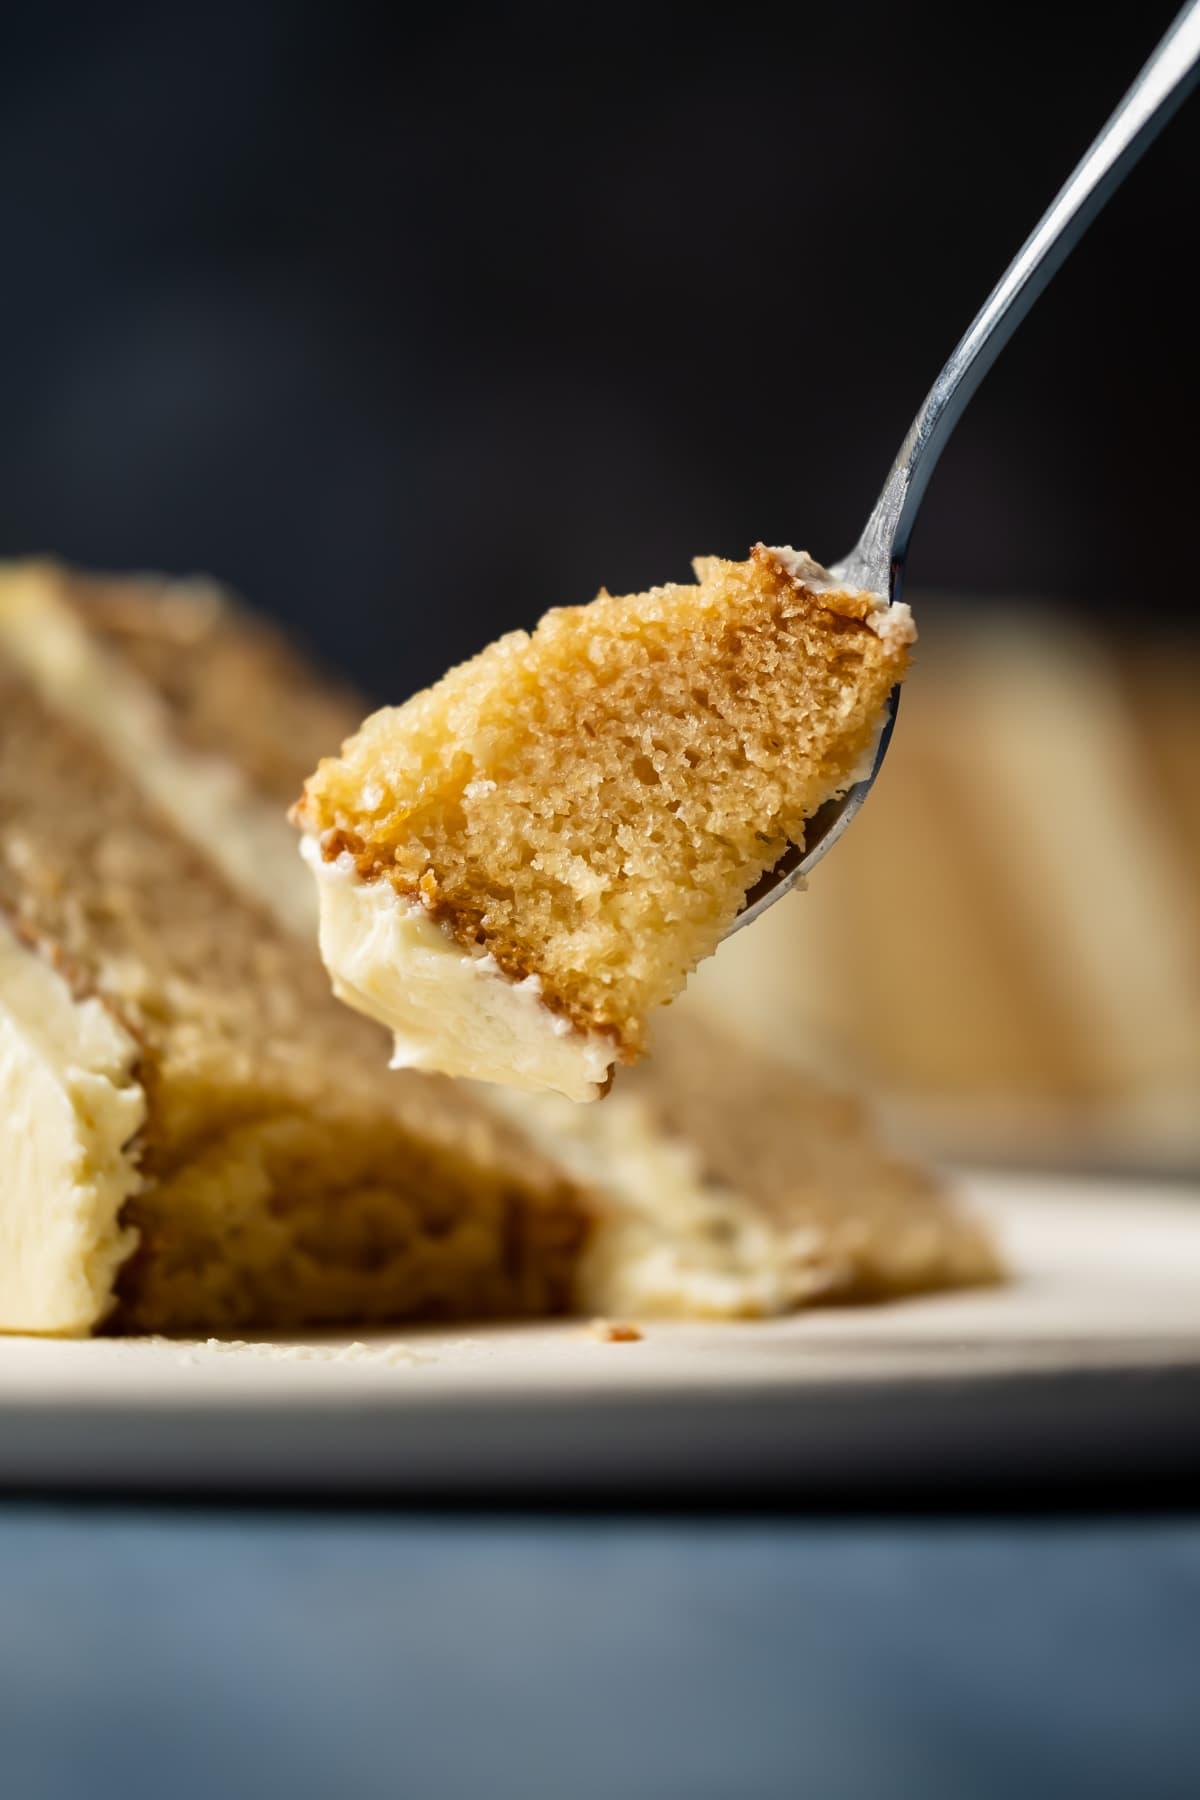 Forkful of eggless vanilla cake.